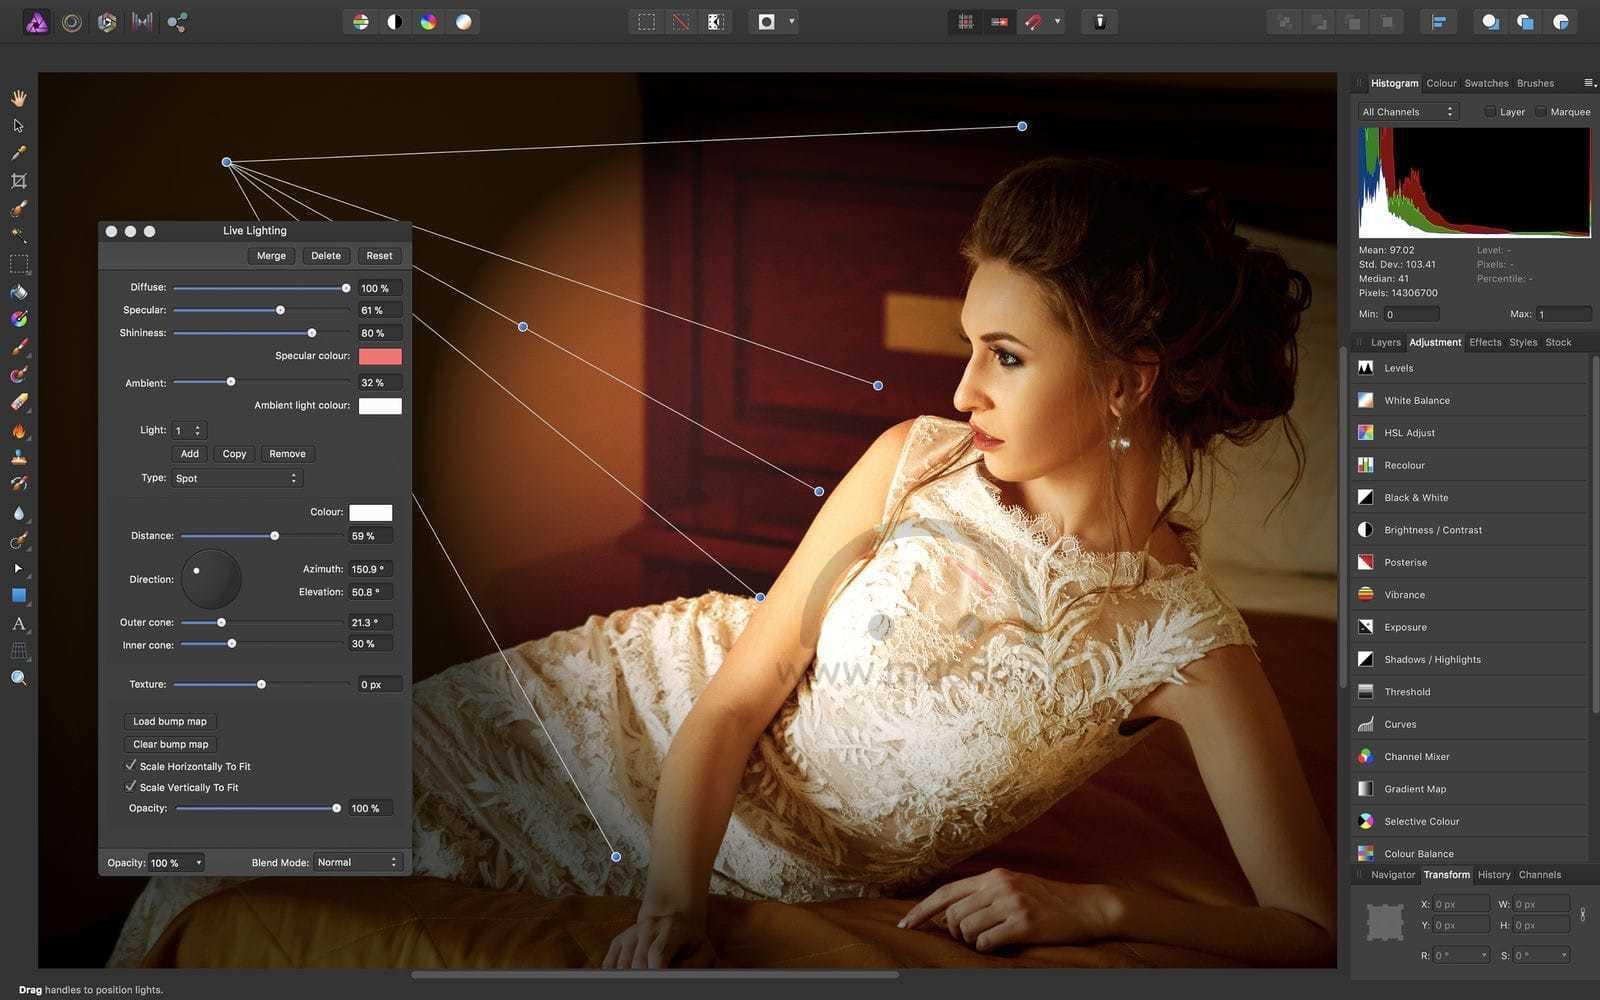 Affinity Photo Beta 1.9.0.199 专业级修图软件 图片处理 第2张